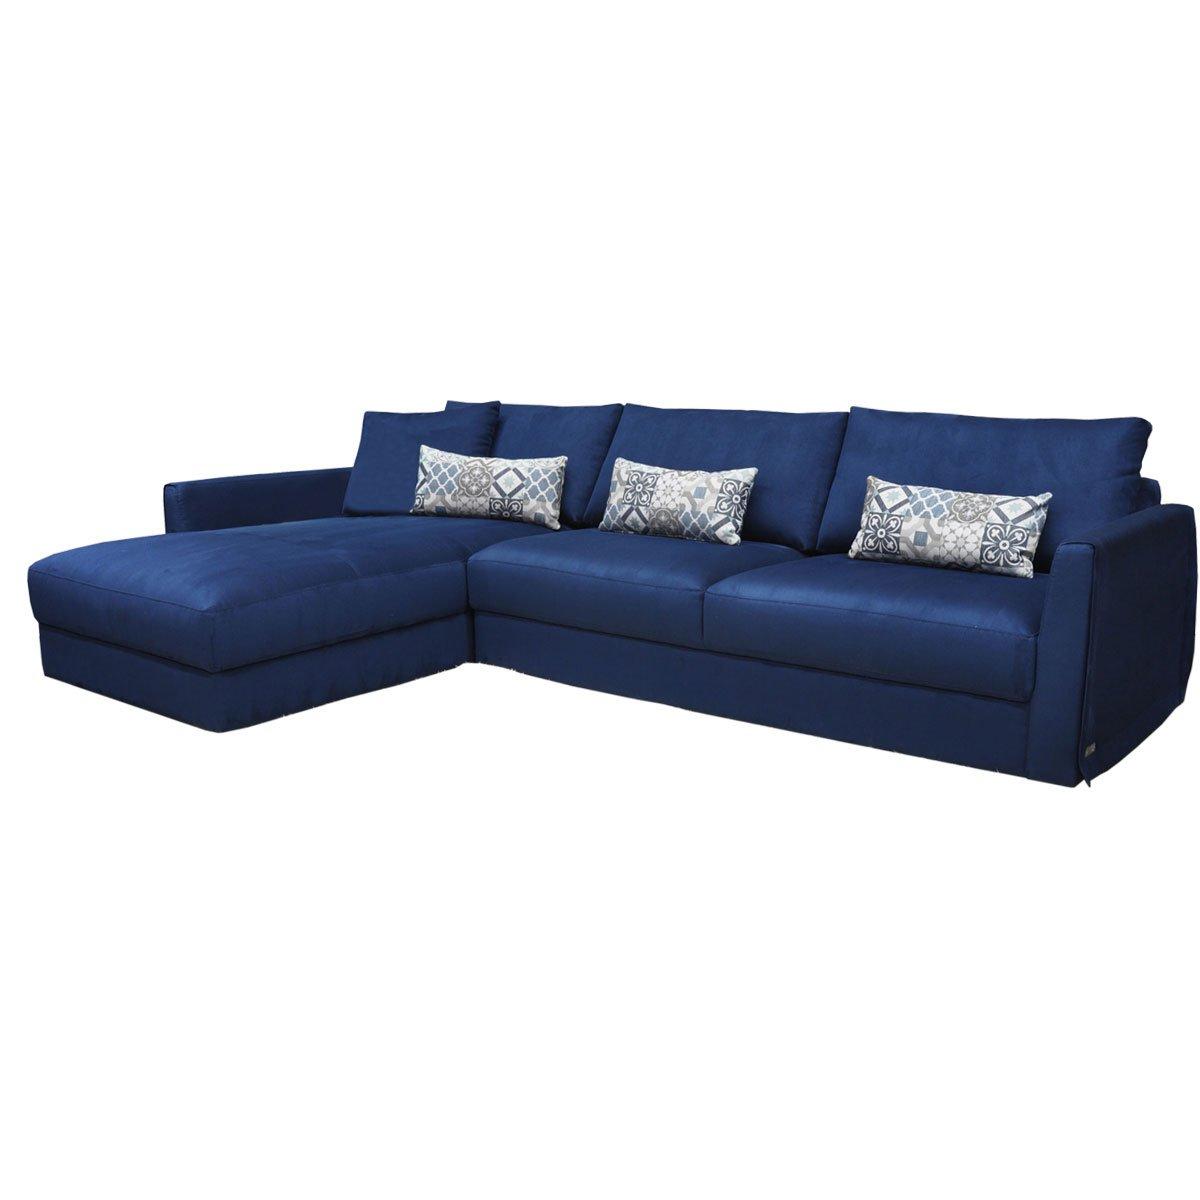 Sala Modular Sienna Izquierda Tela Azul Muebles Liz